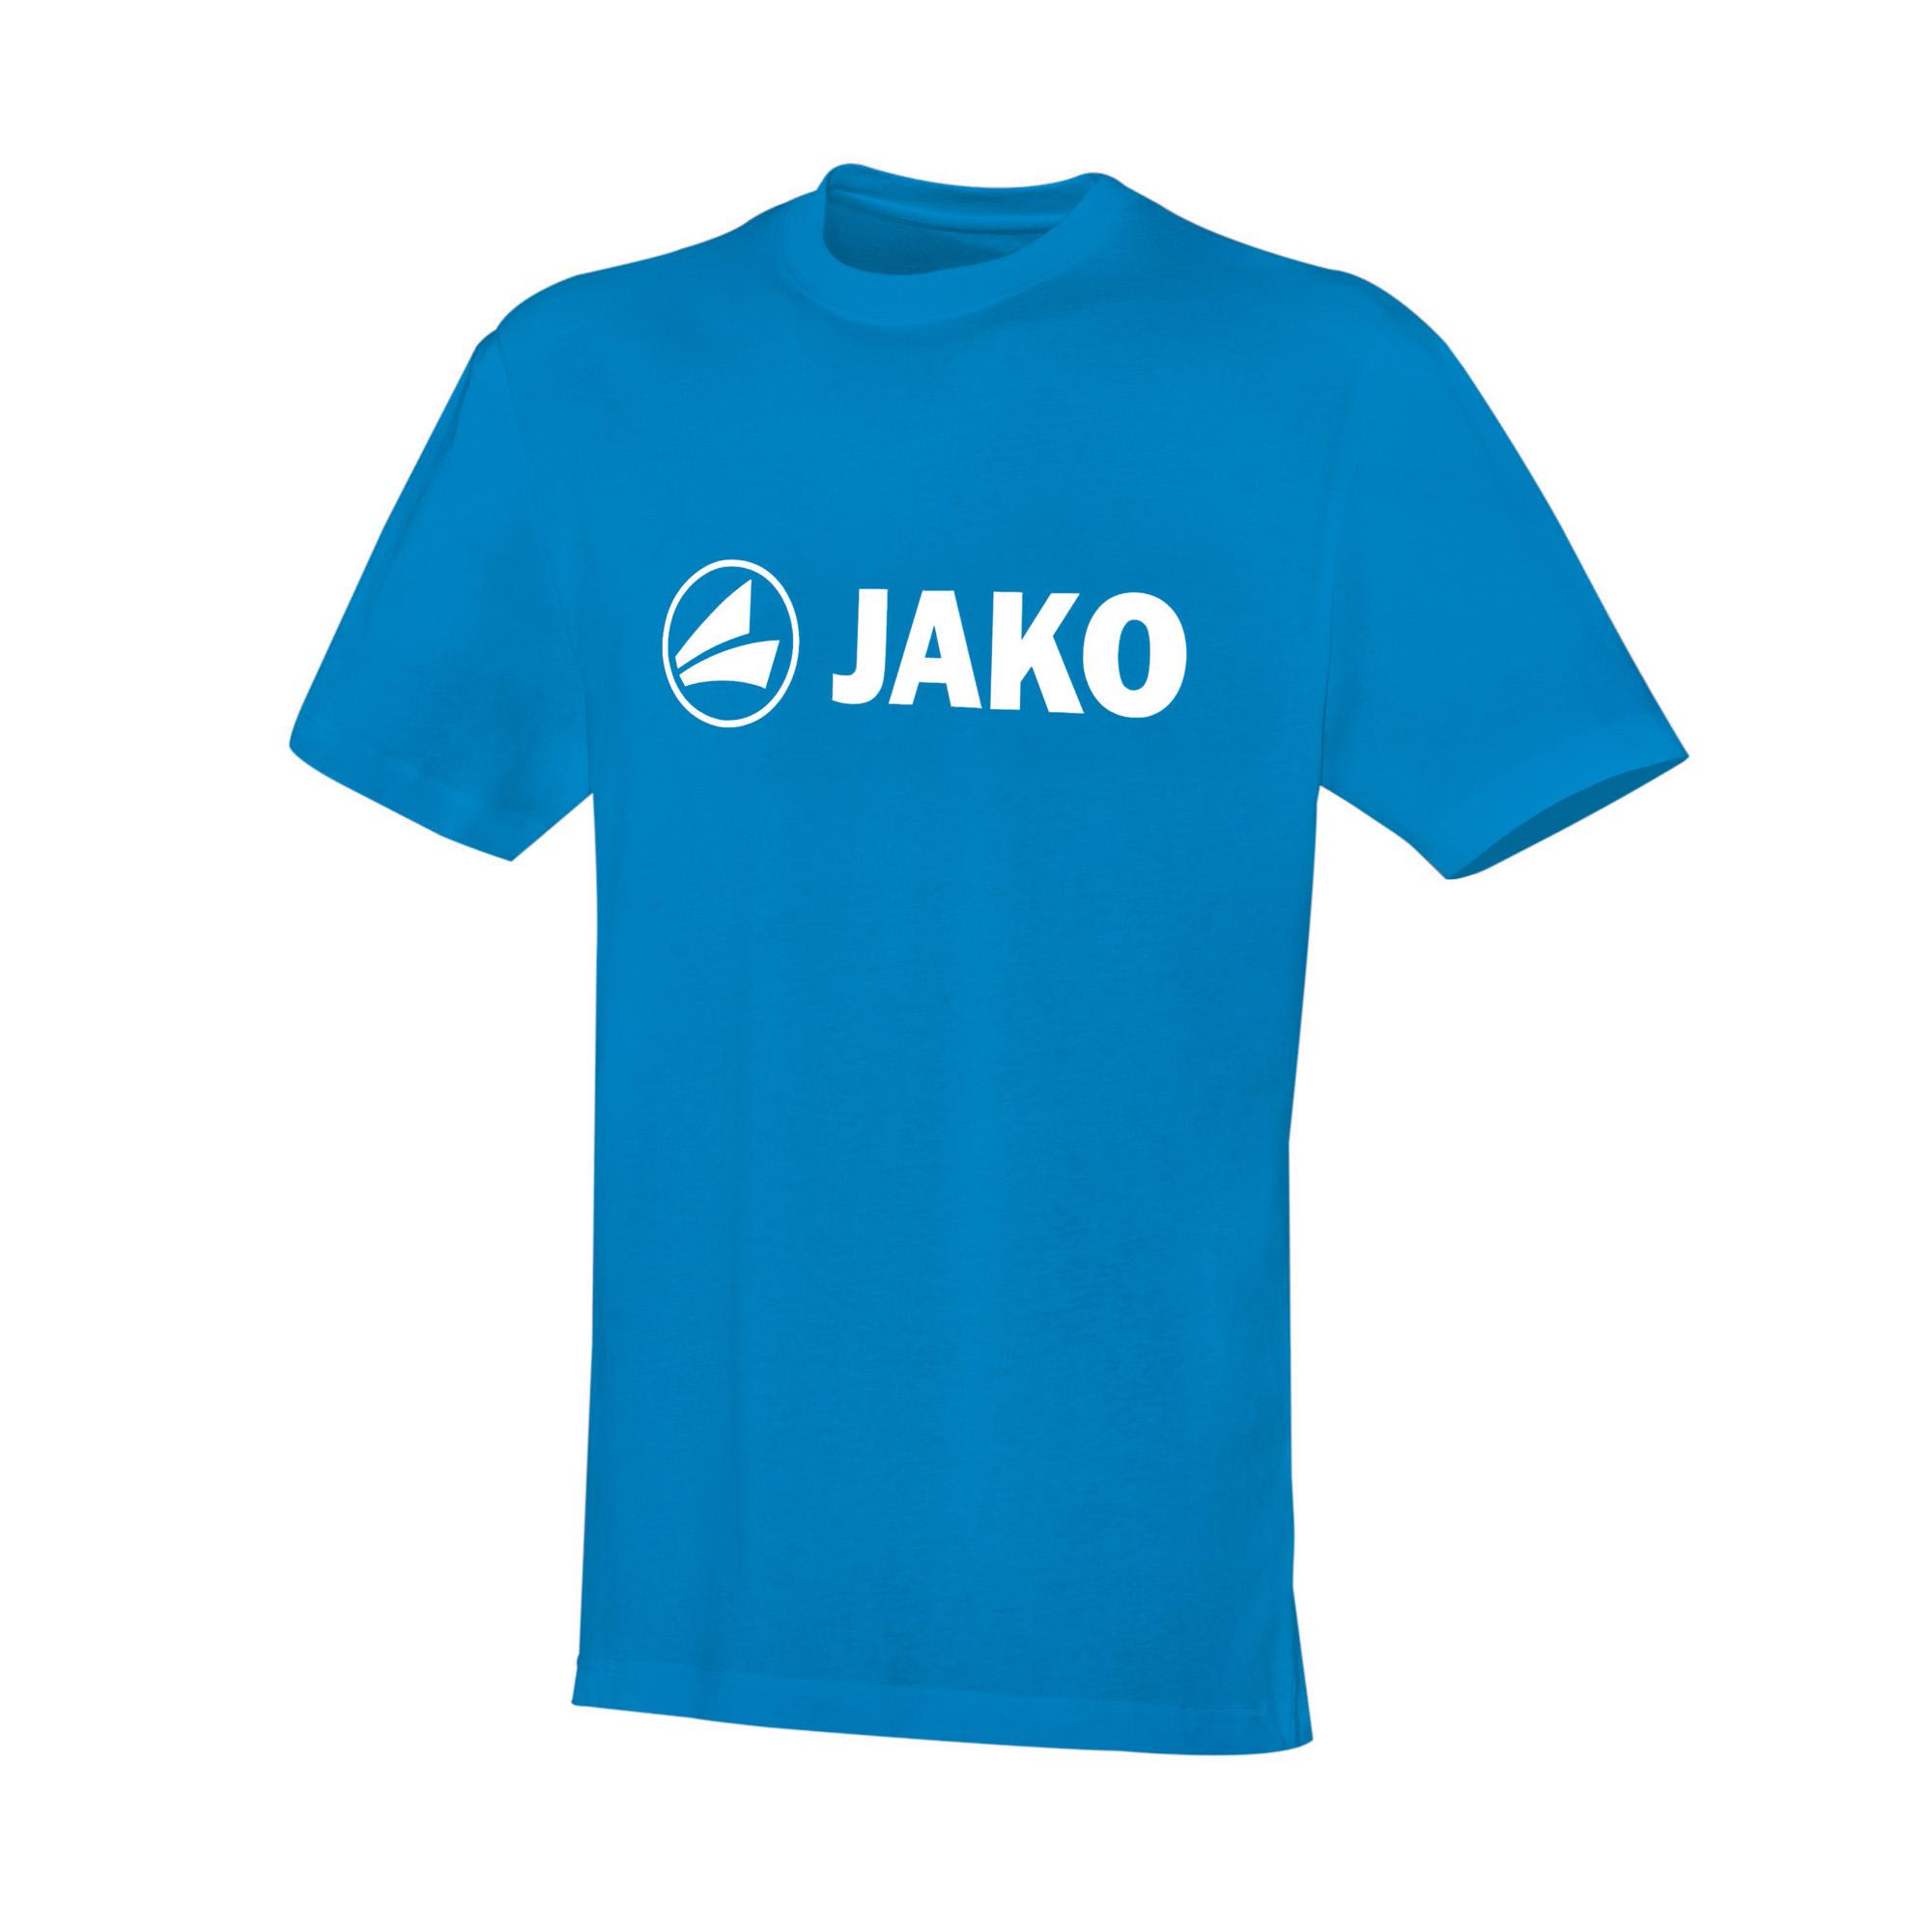 Jako Herren T-Shirt Promo 6163-89 S